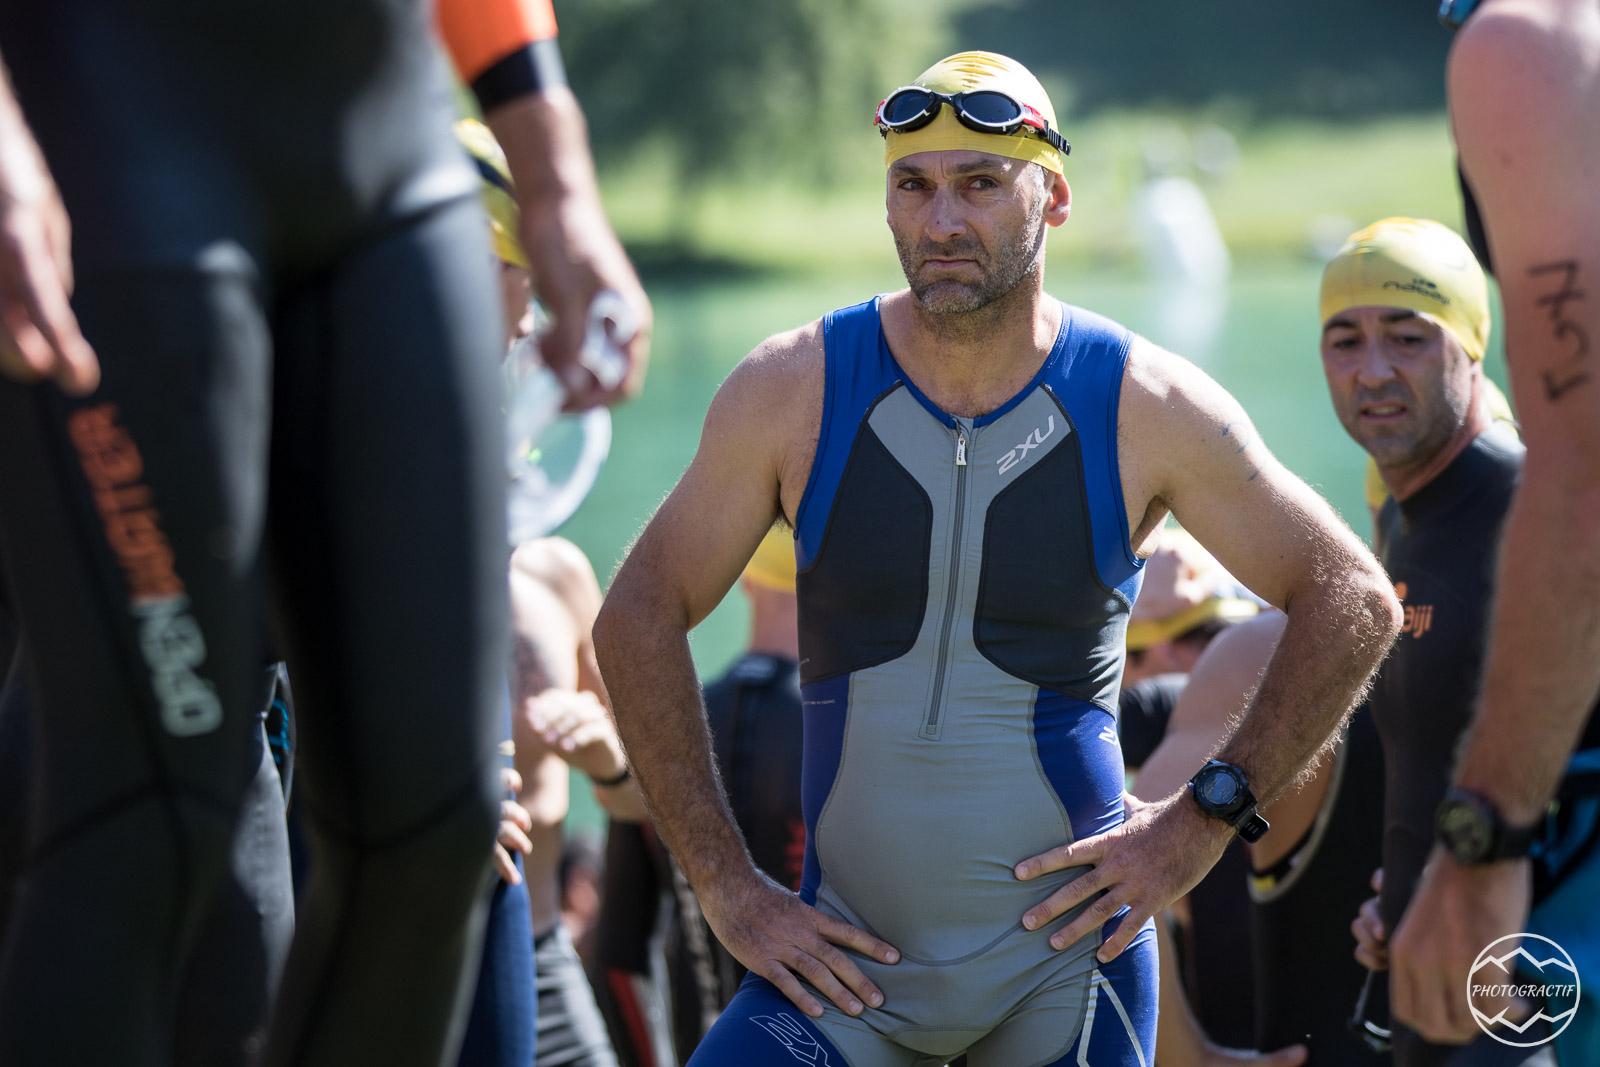 Triathlon Felt CSO 2018 (62)